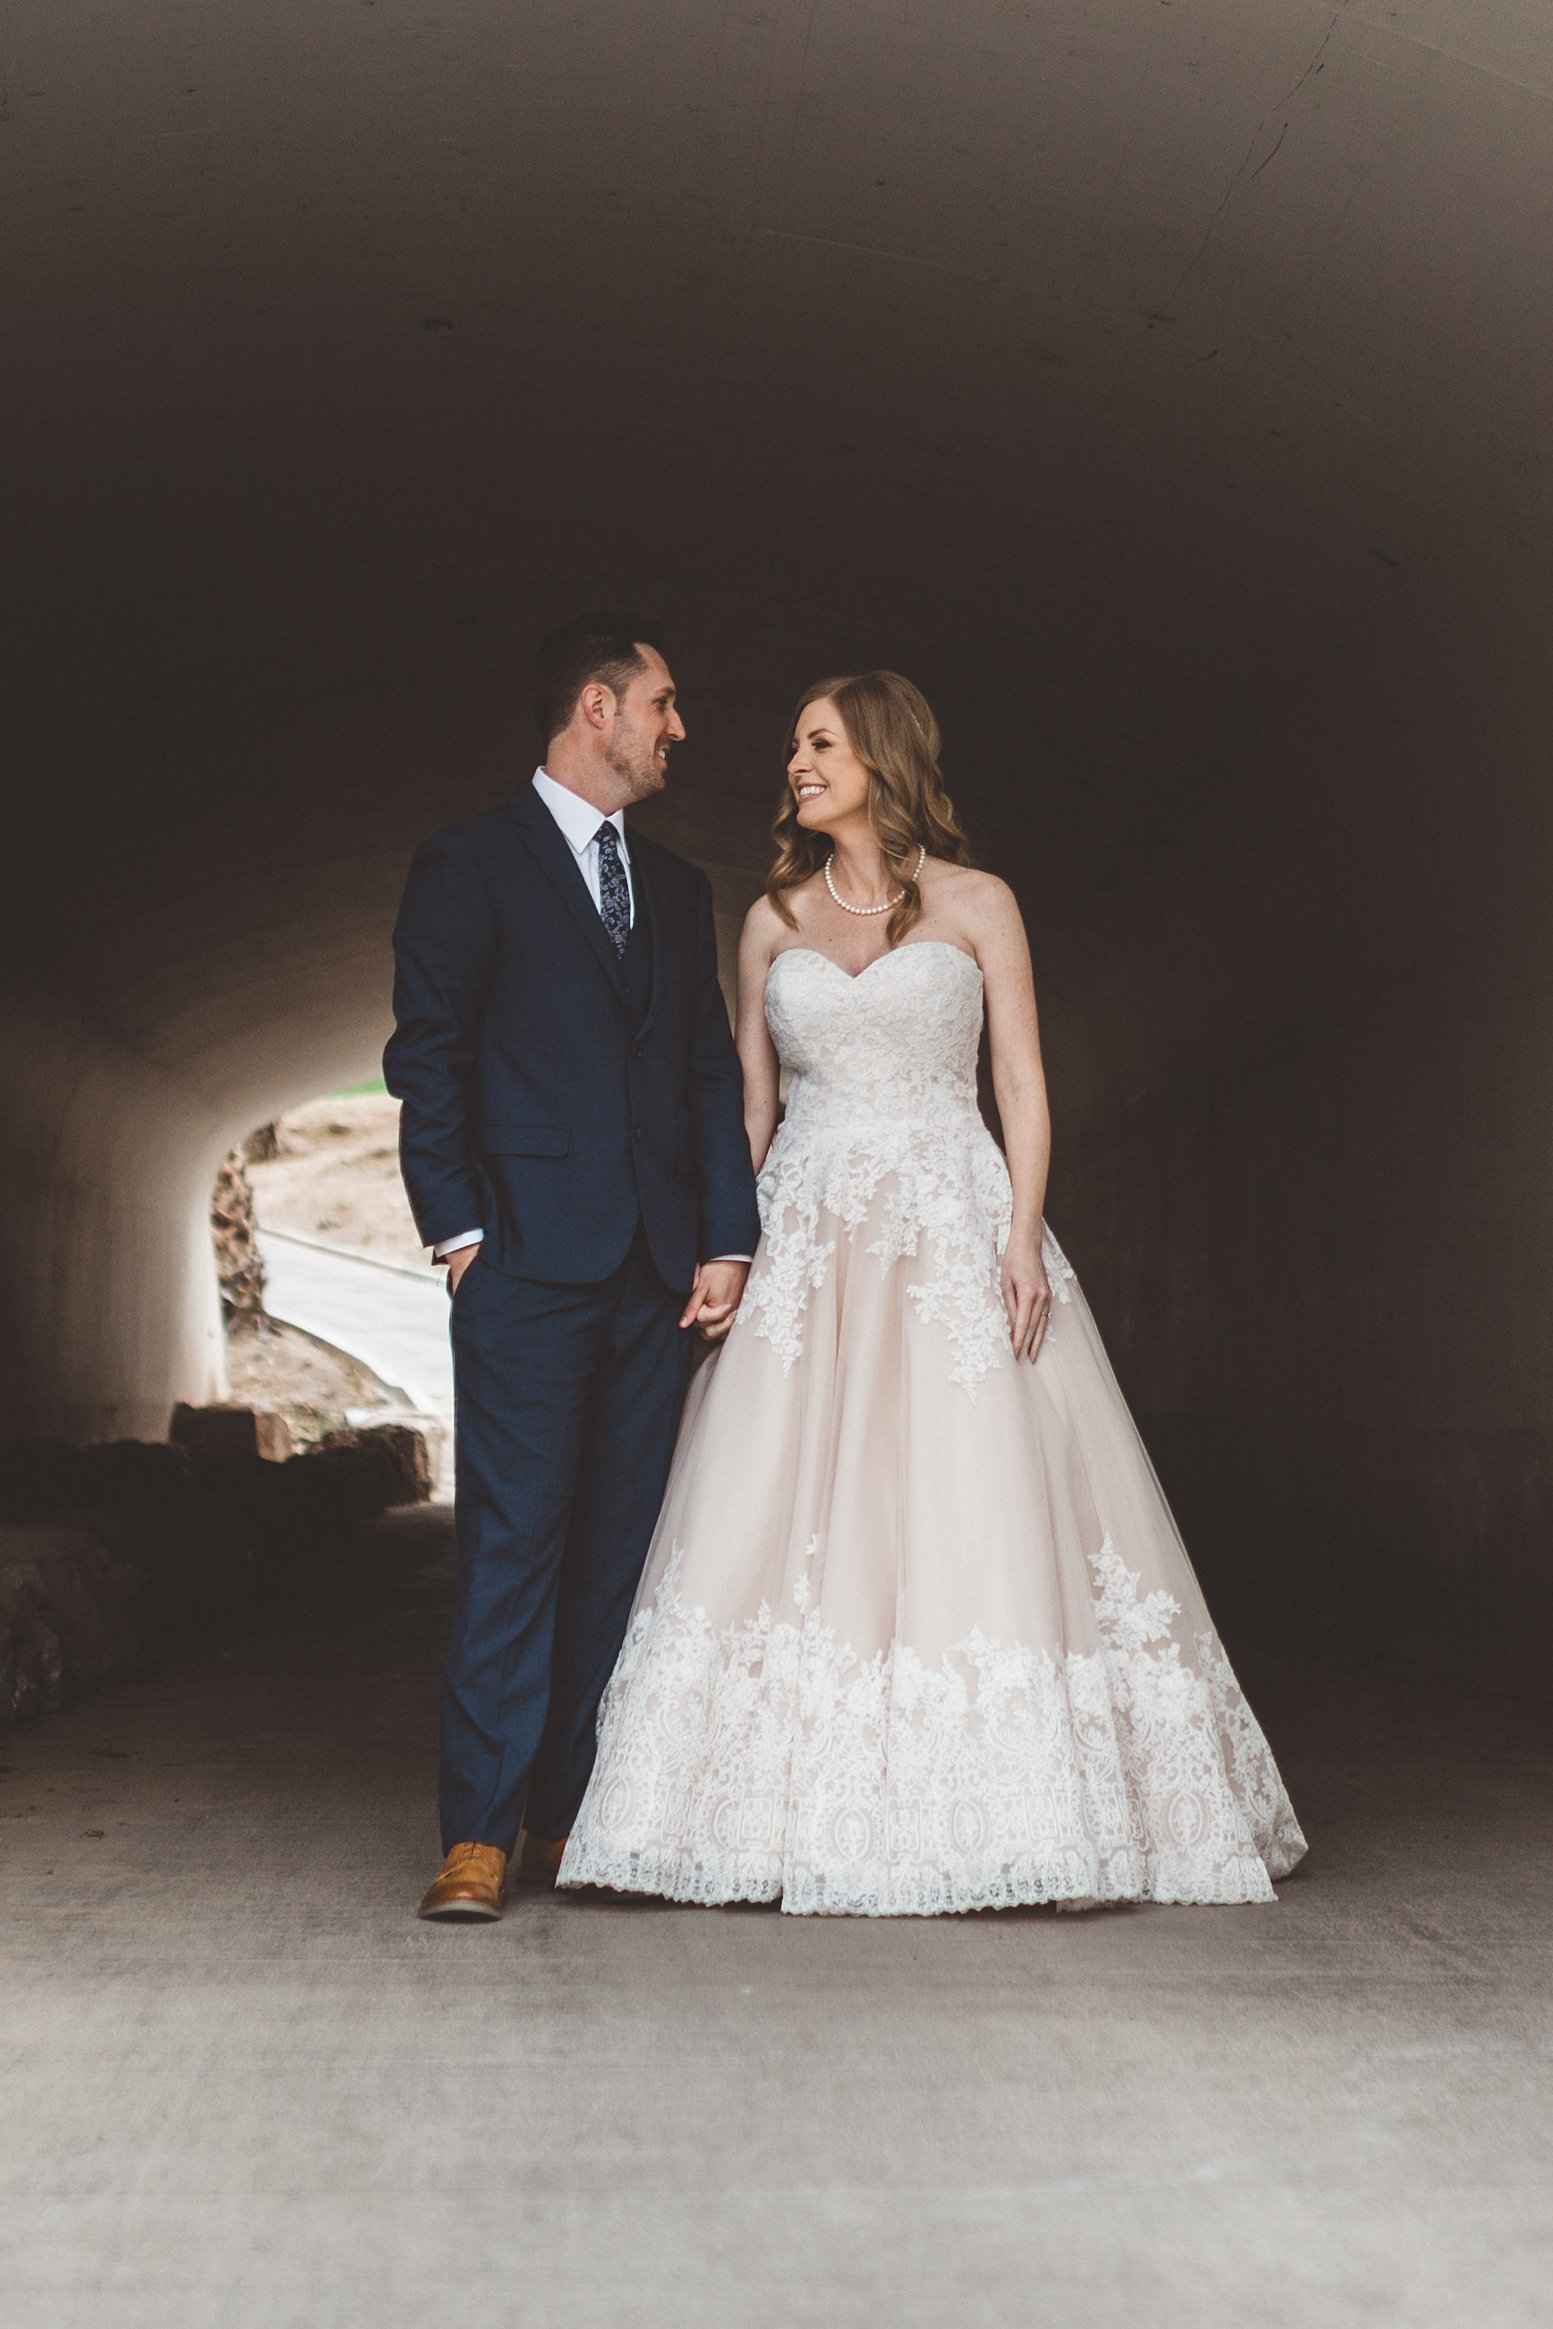 lindsey-and-ryan-intimate-winter-wedding20.jpg